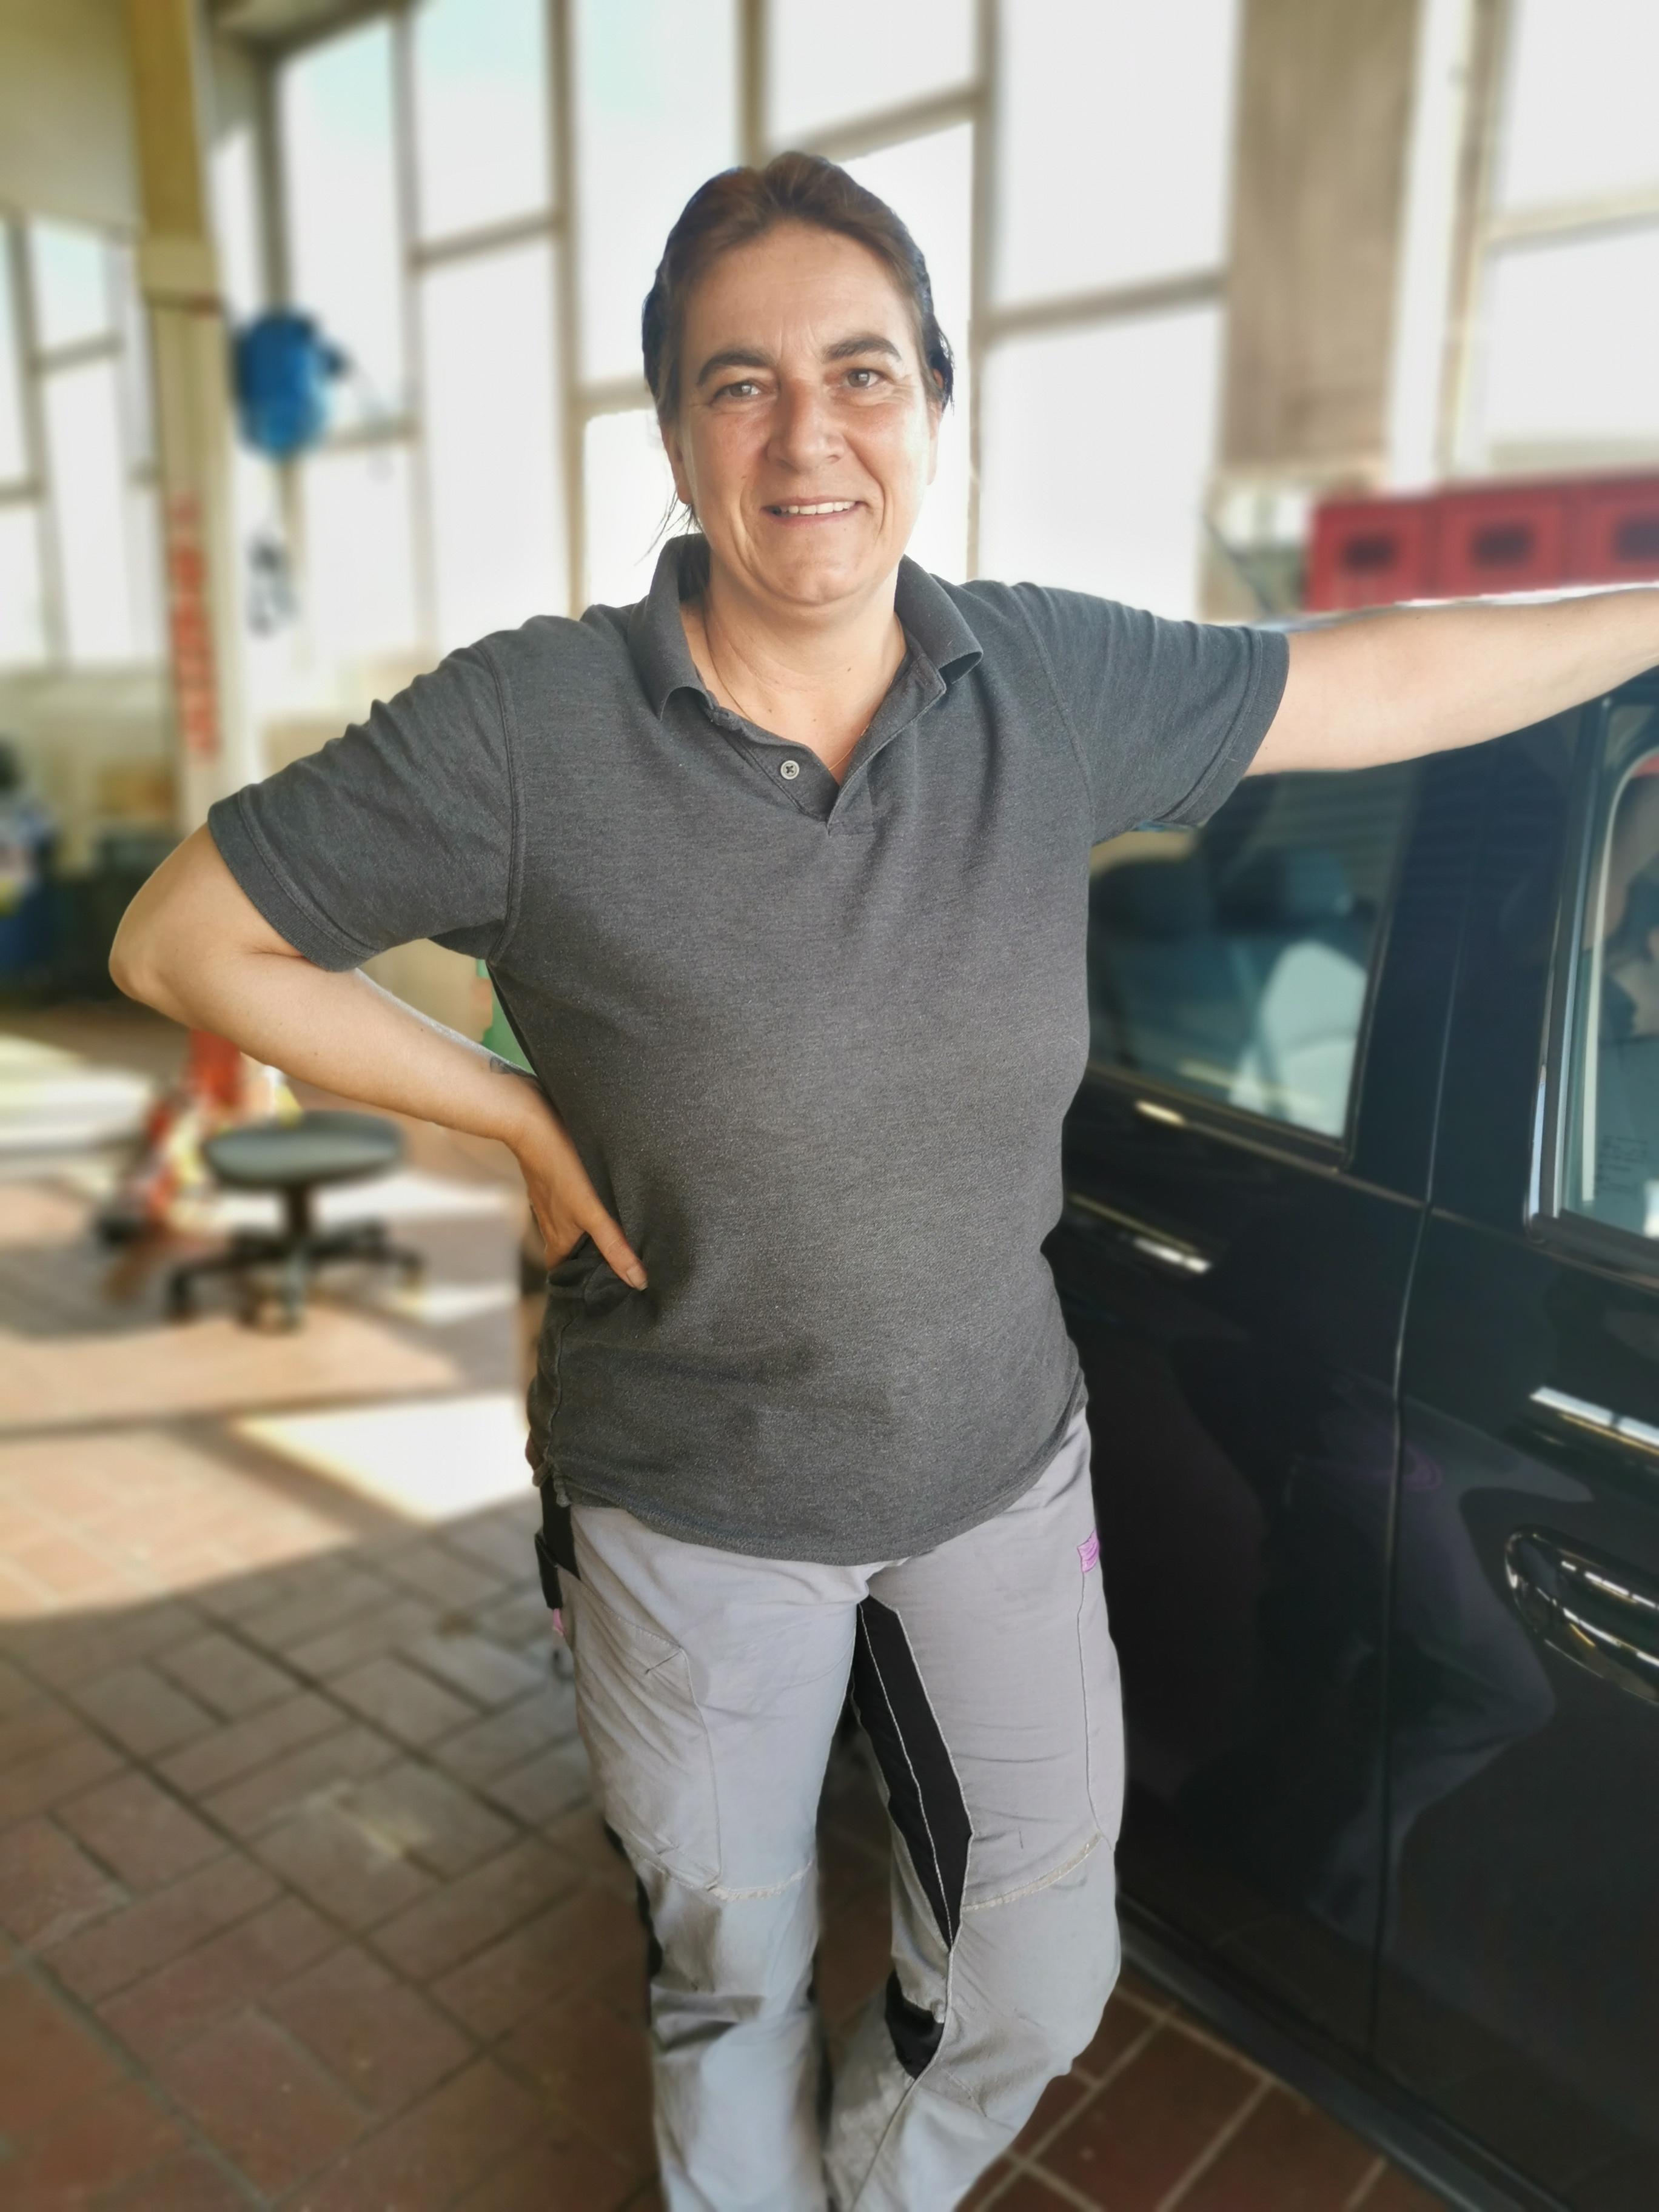 Sonnleitner-Unger Silvia : Fahrzeugaufbereitung